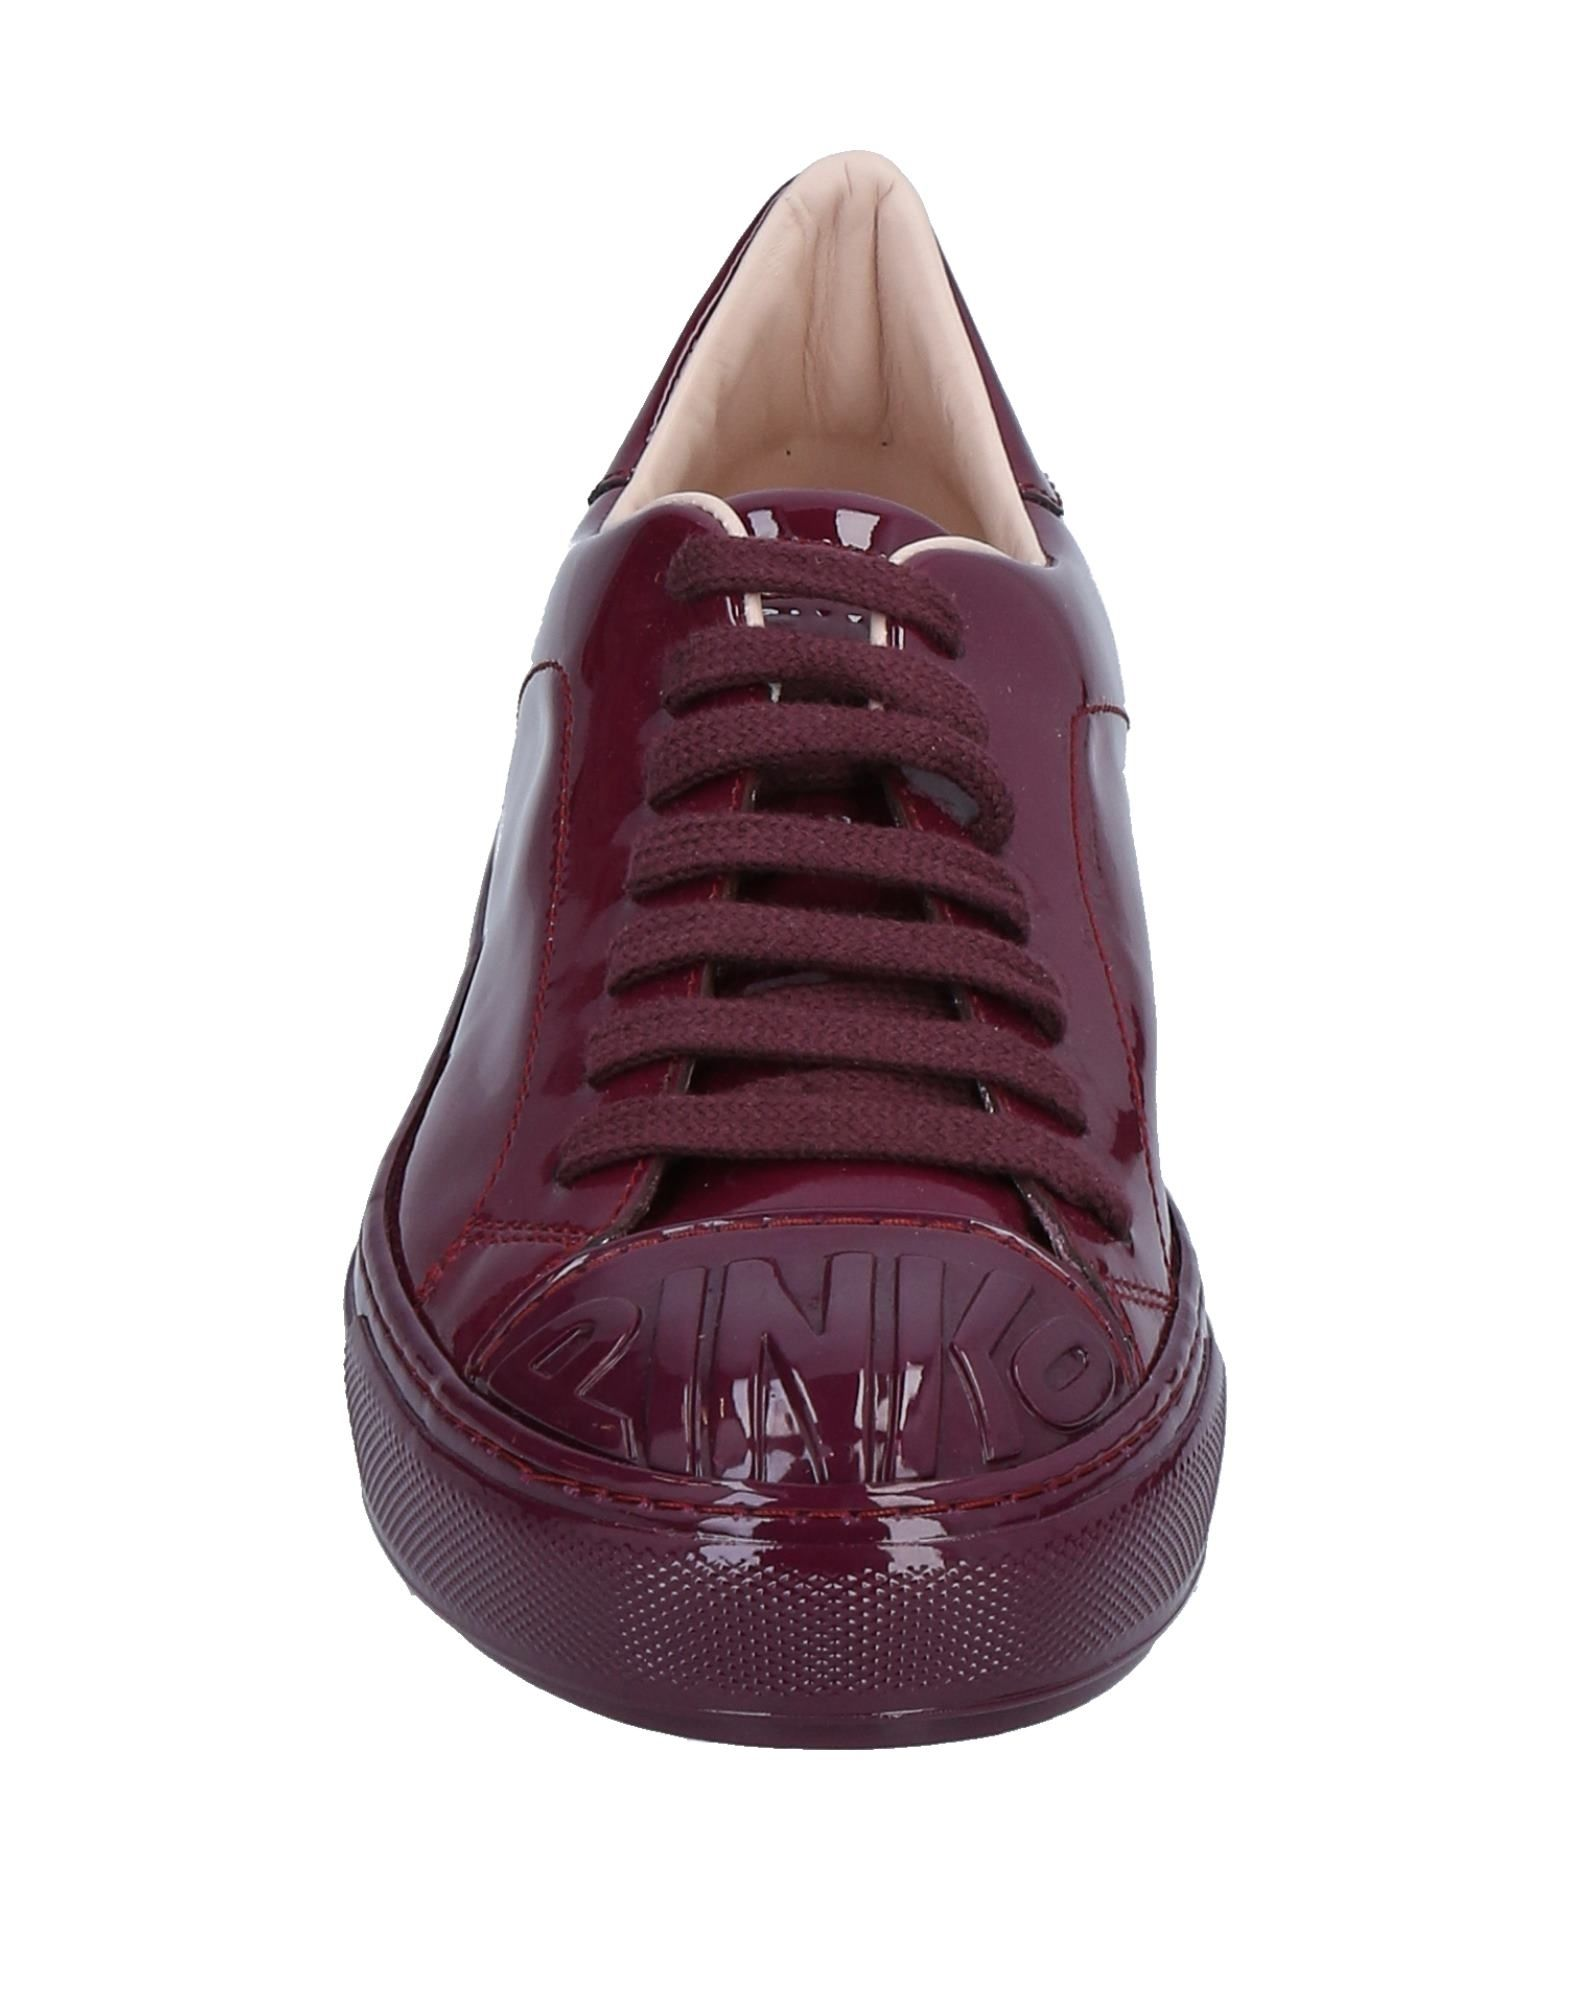 Pinko Sneakers Damen Damen Damen  11543743DB Gute Qualität beliebte Schuhe 0efa1f